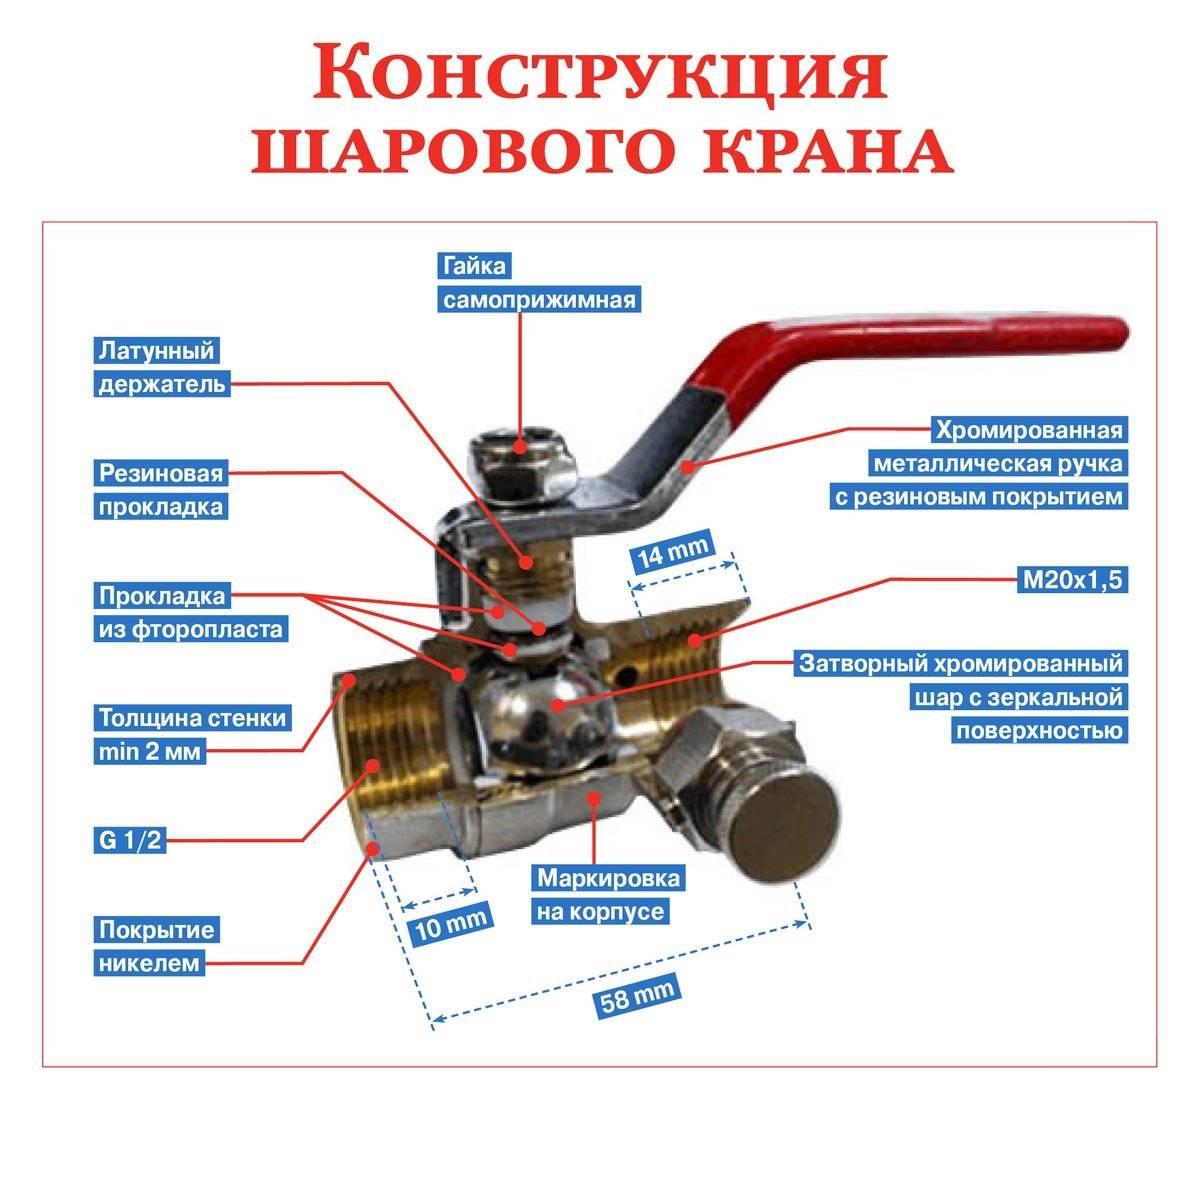 Устройство шарового крана, технические характеристики по гост 21345-2005 и производители